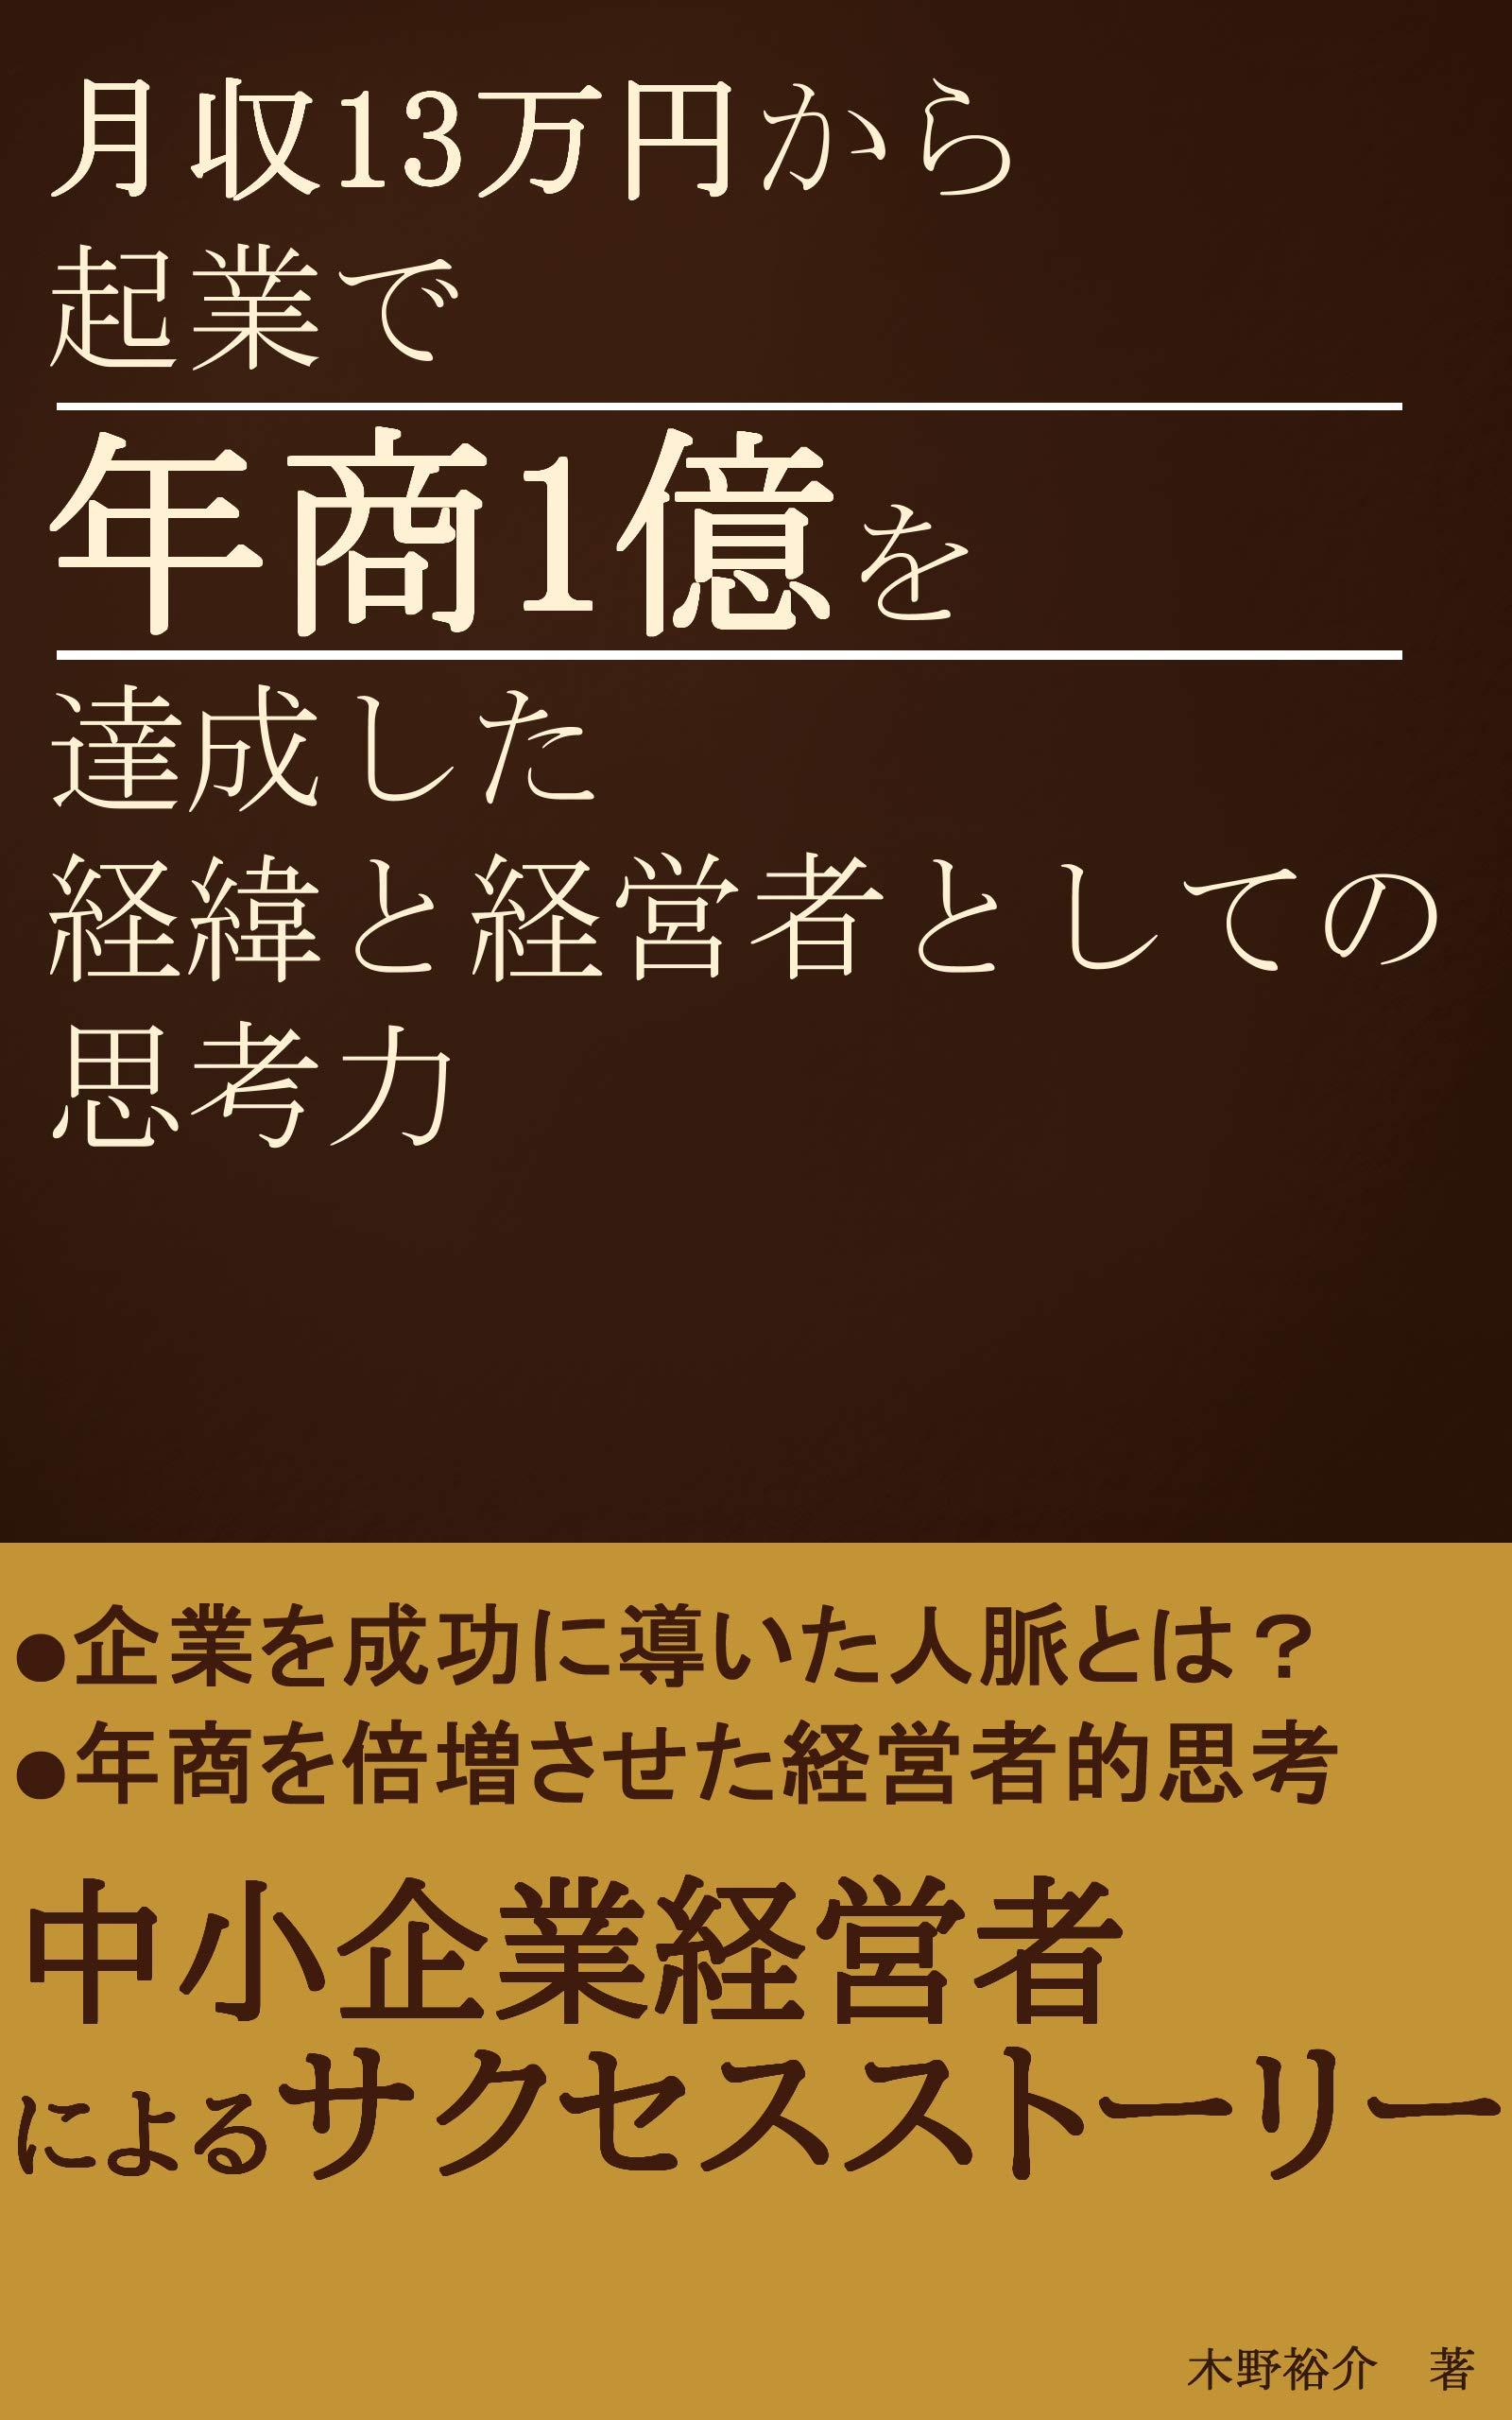 gessyuu13manenkarakigyoudenensyouichiokuwotasseisitakeiitokeieishatositenoshikouryoku: tyusyokigyoukeieisyaniyorusuccessstory (Japanese Edition)